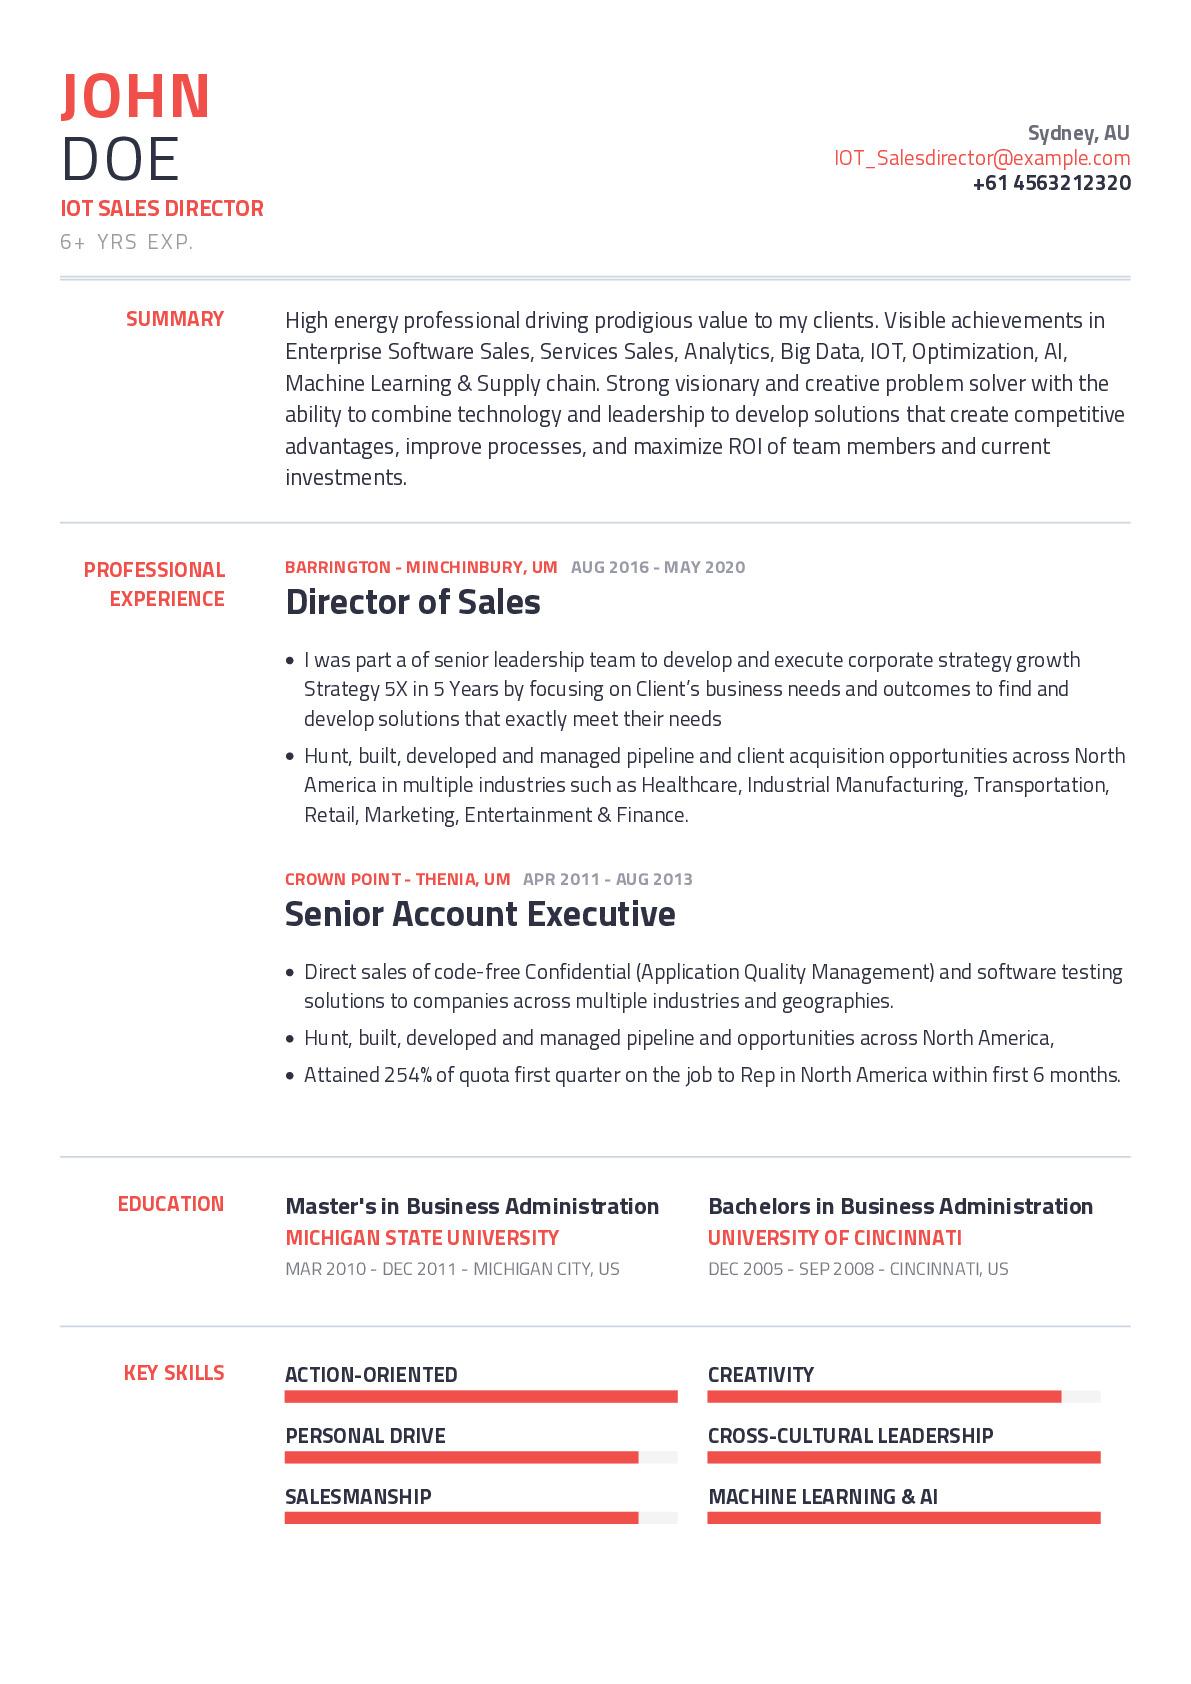 IOT Sales Director Resume Example